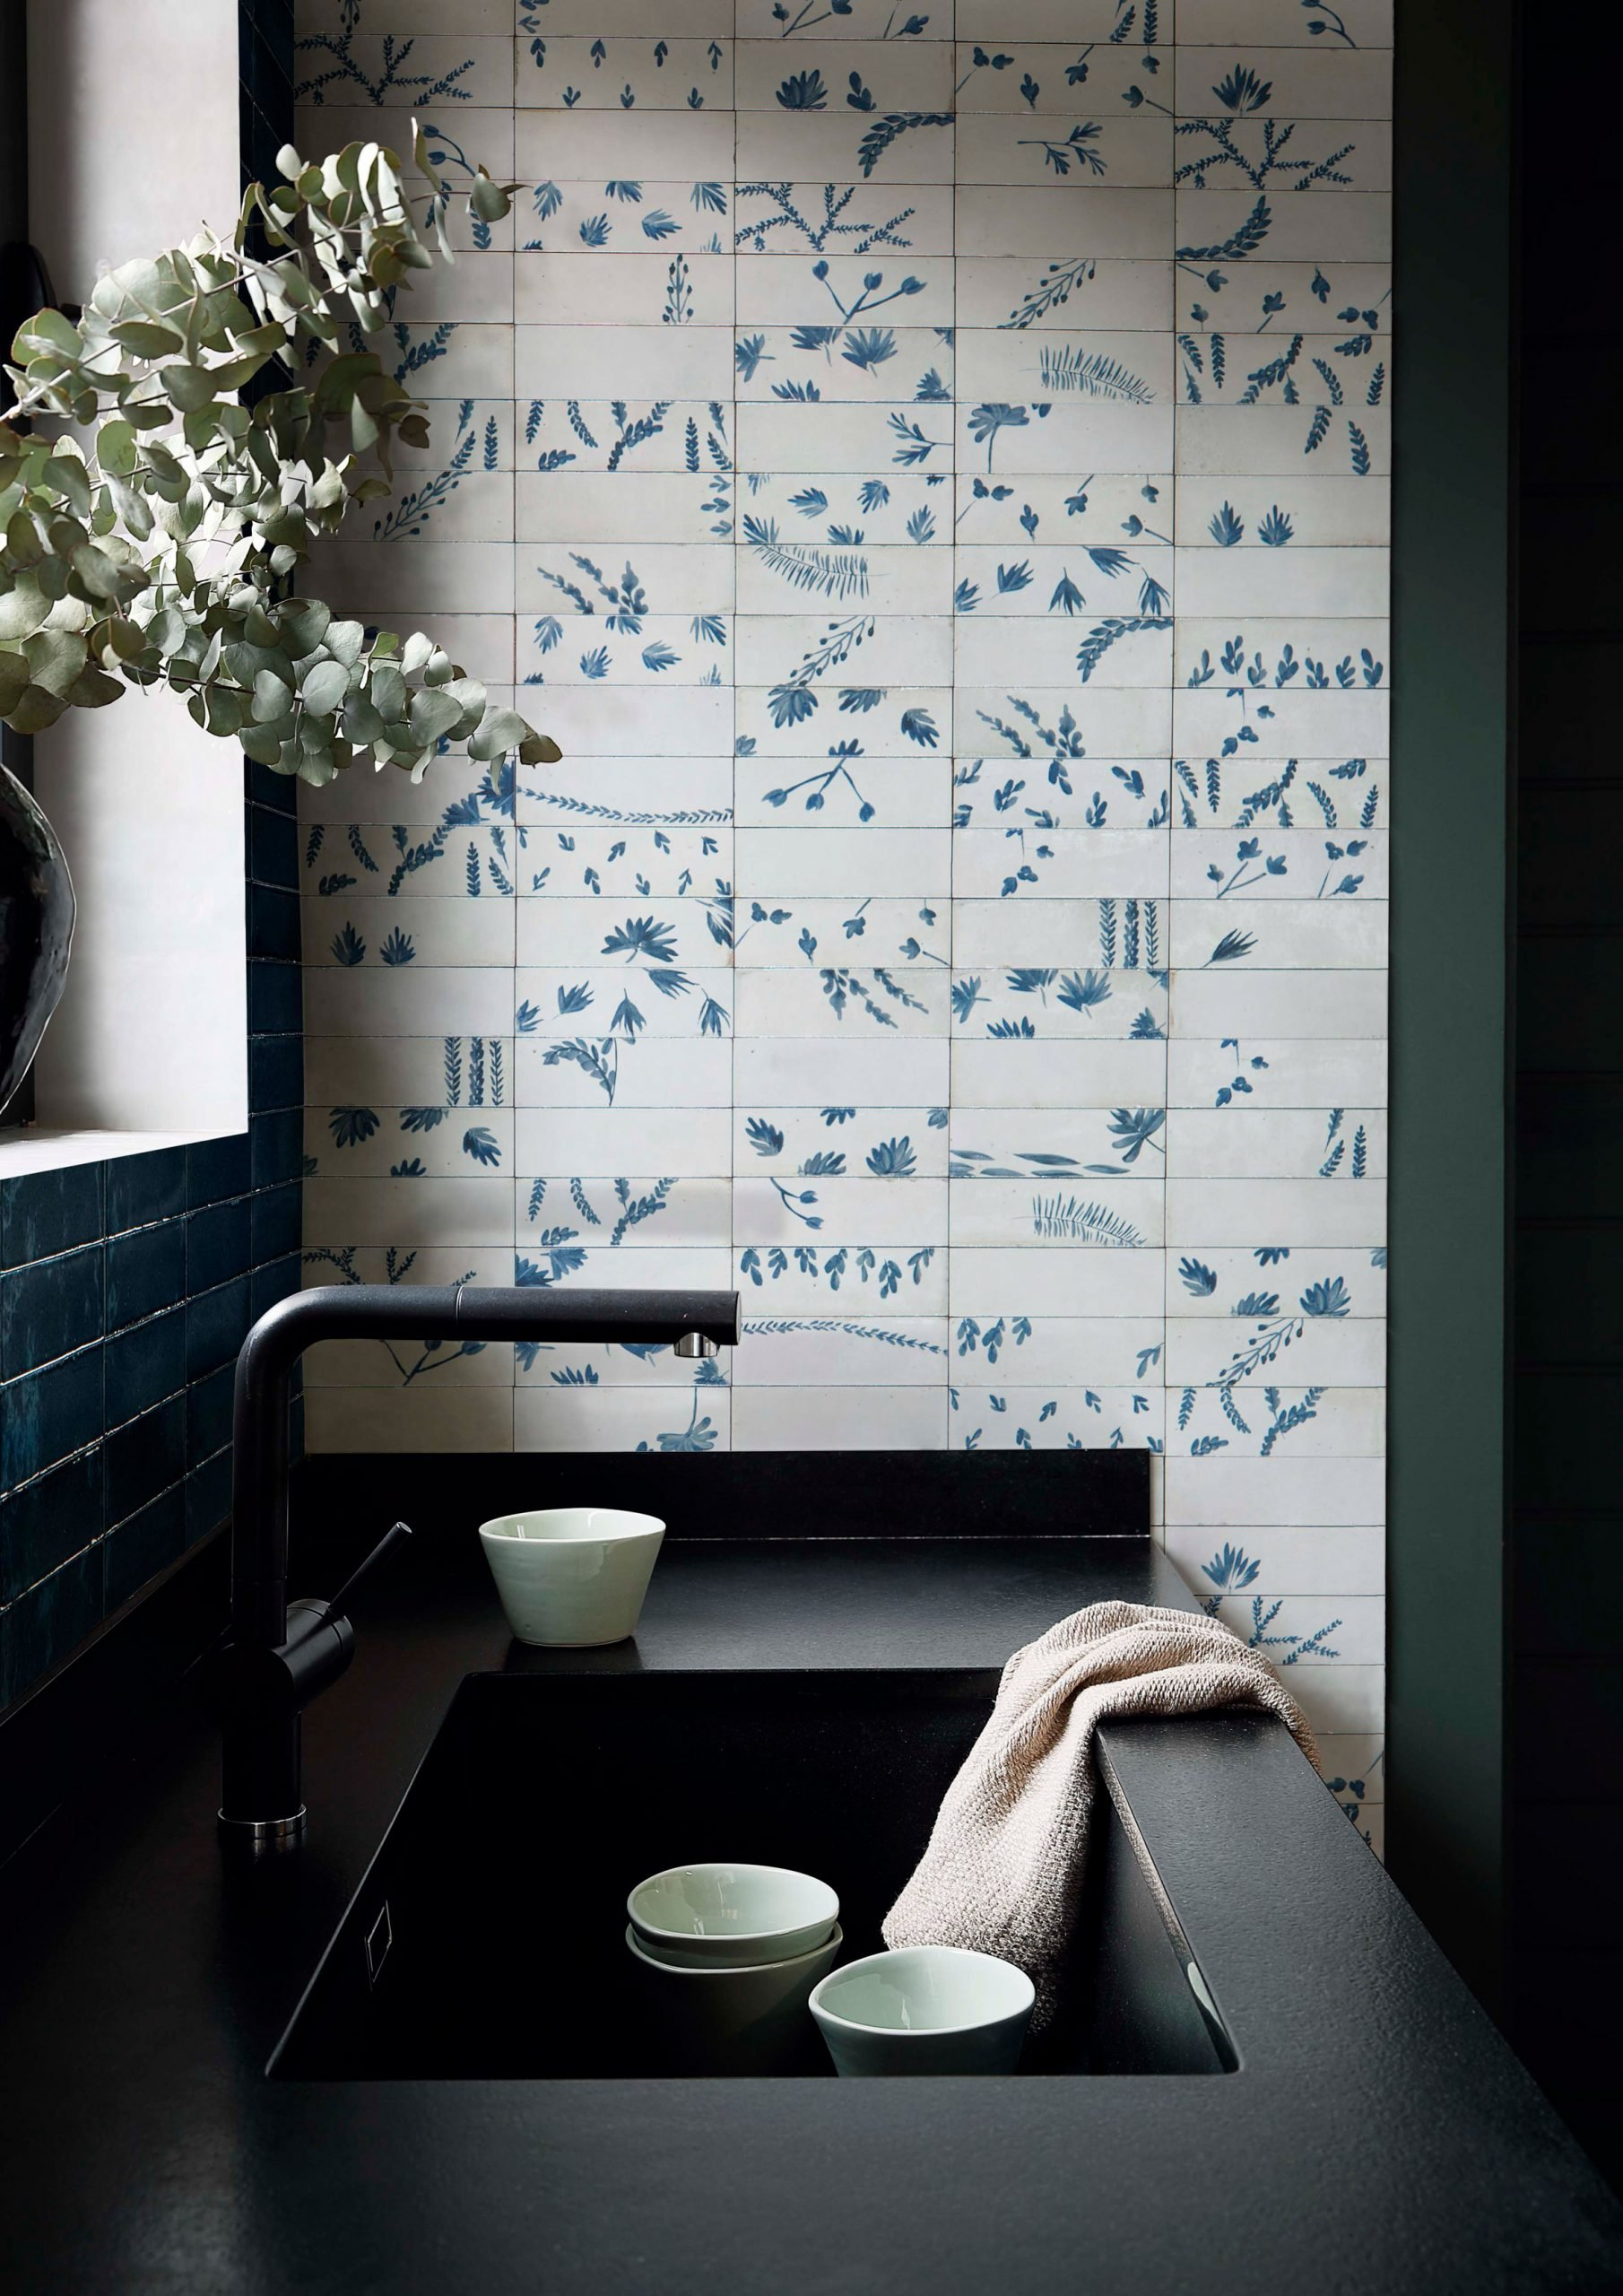 Botanical blue prints on Mediterrean-style kitchen tiles